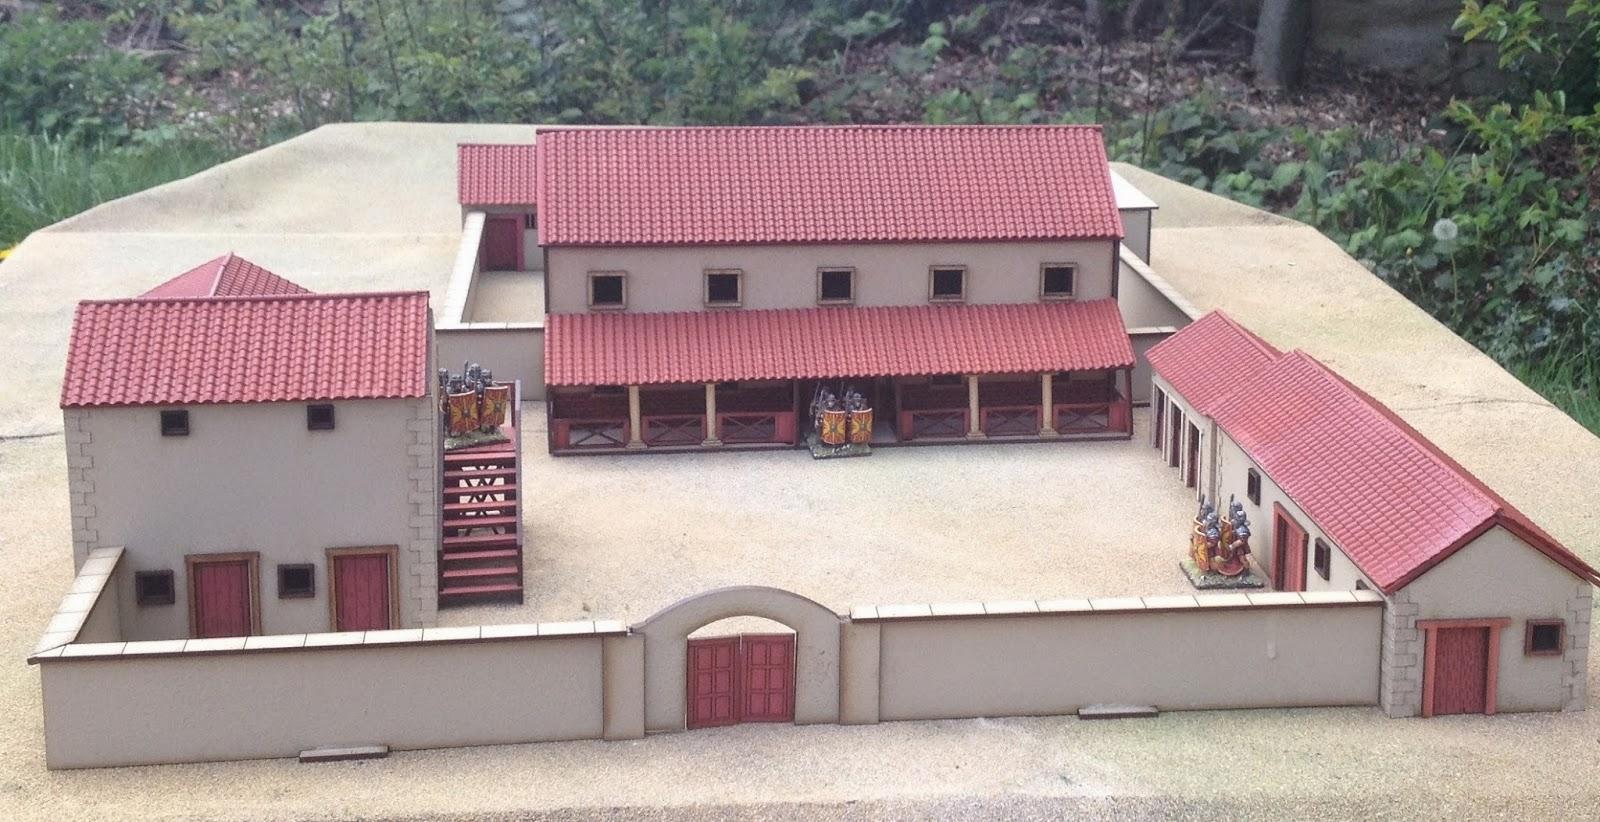 How To Make A Model Roman Villa